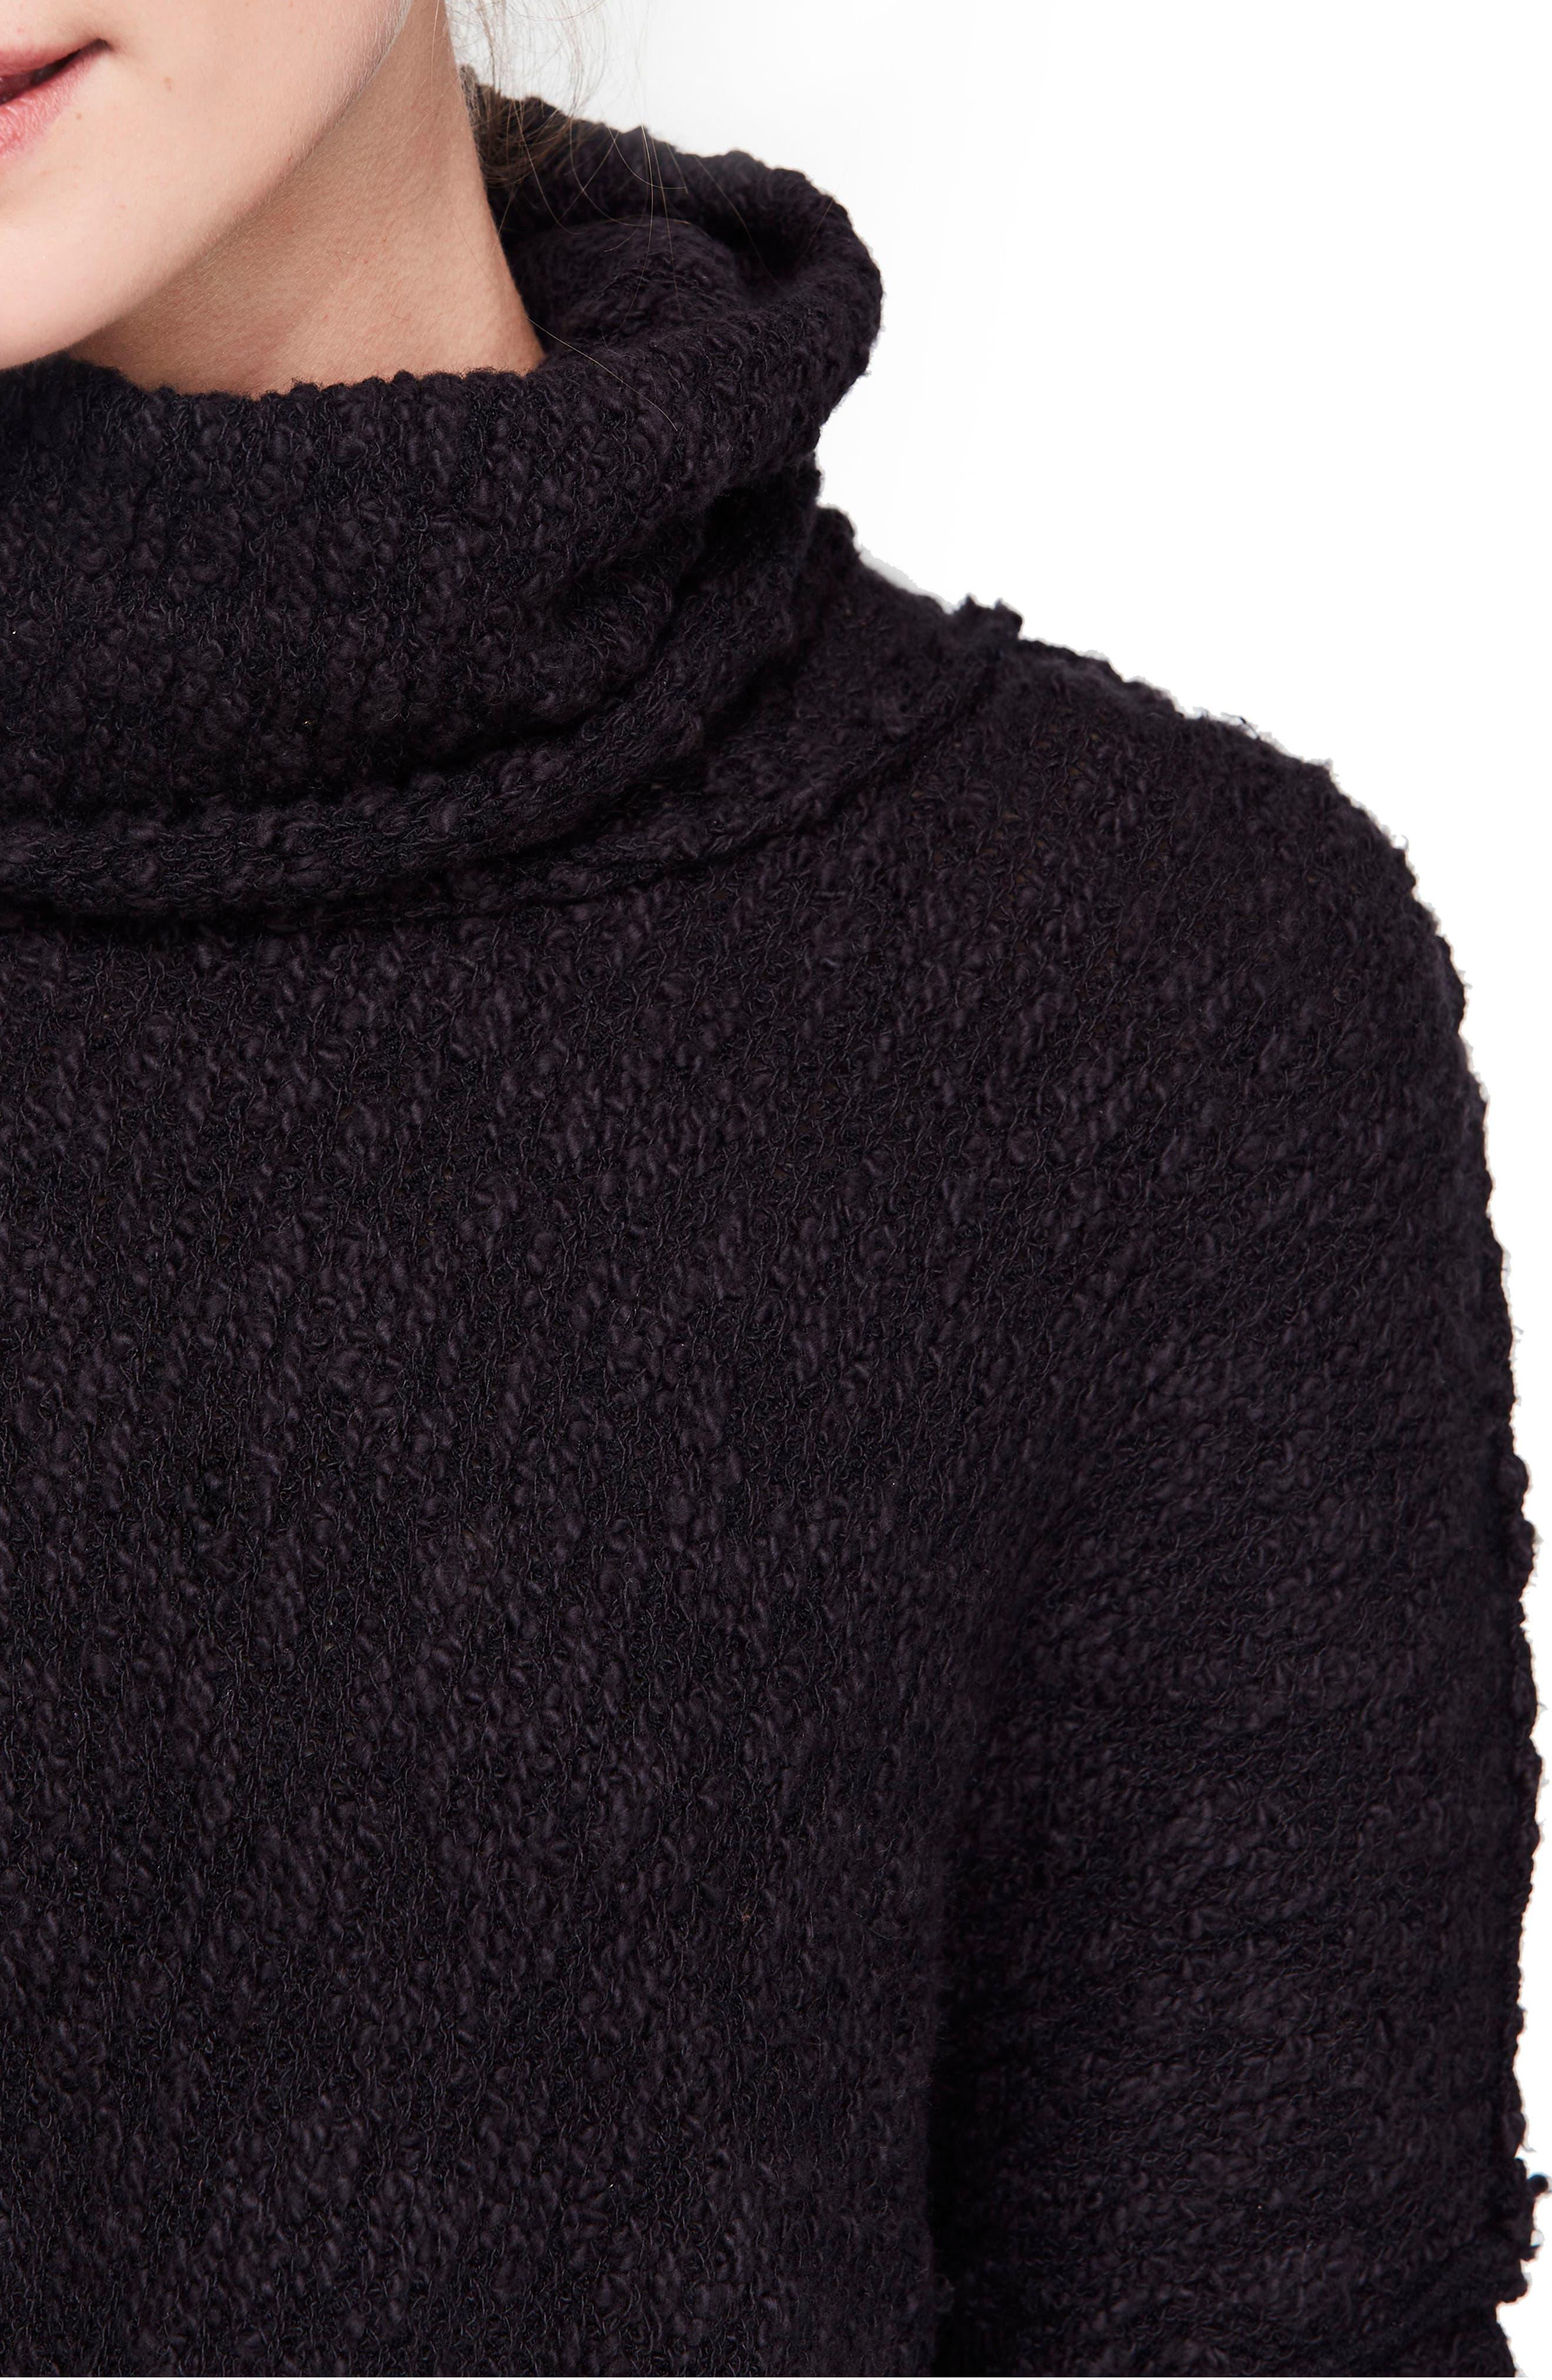 Big Easy Cowl Neck Crop Sweater,                             Alternate thumbnail 4, color,                             BLACK